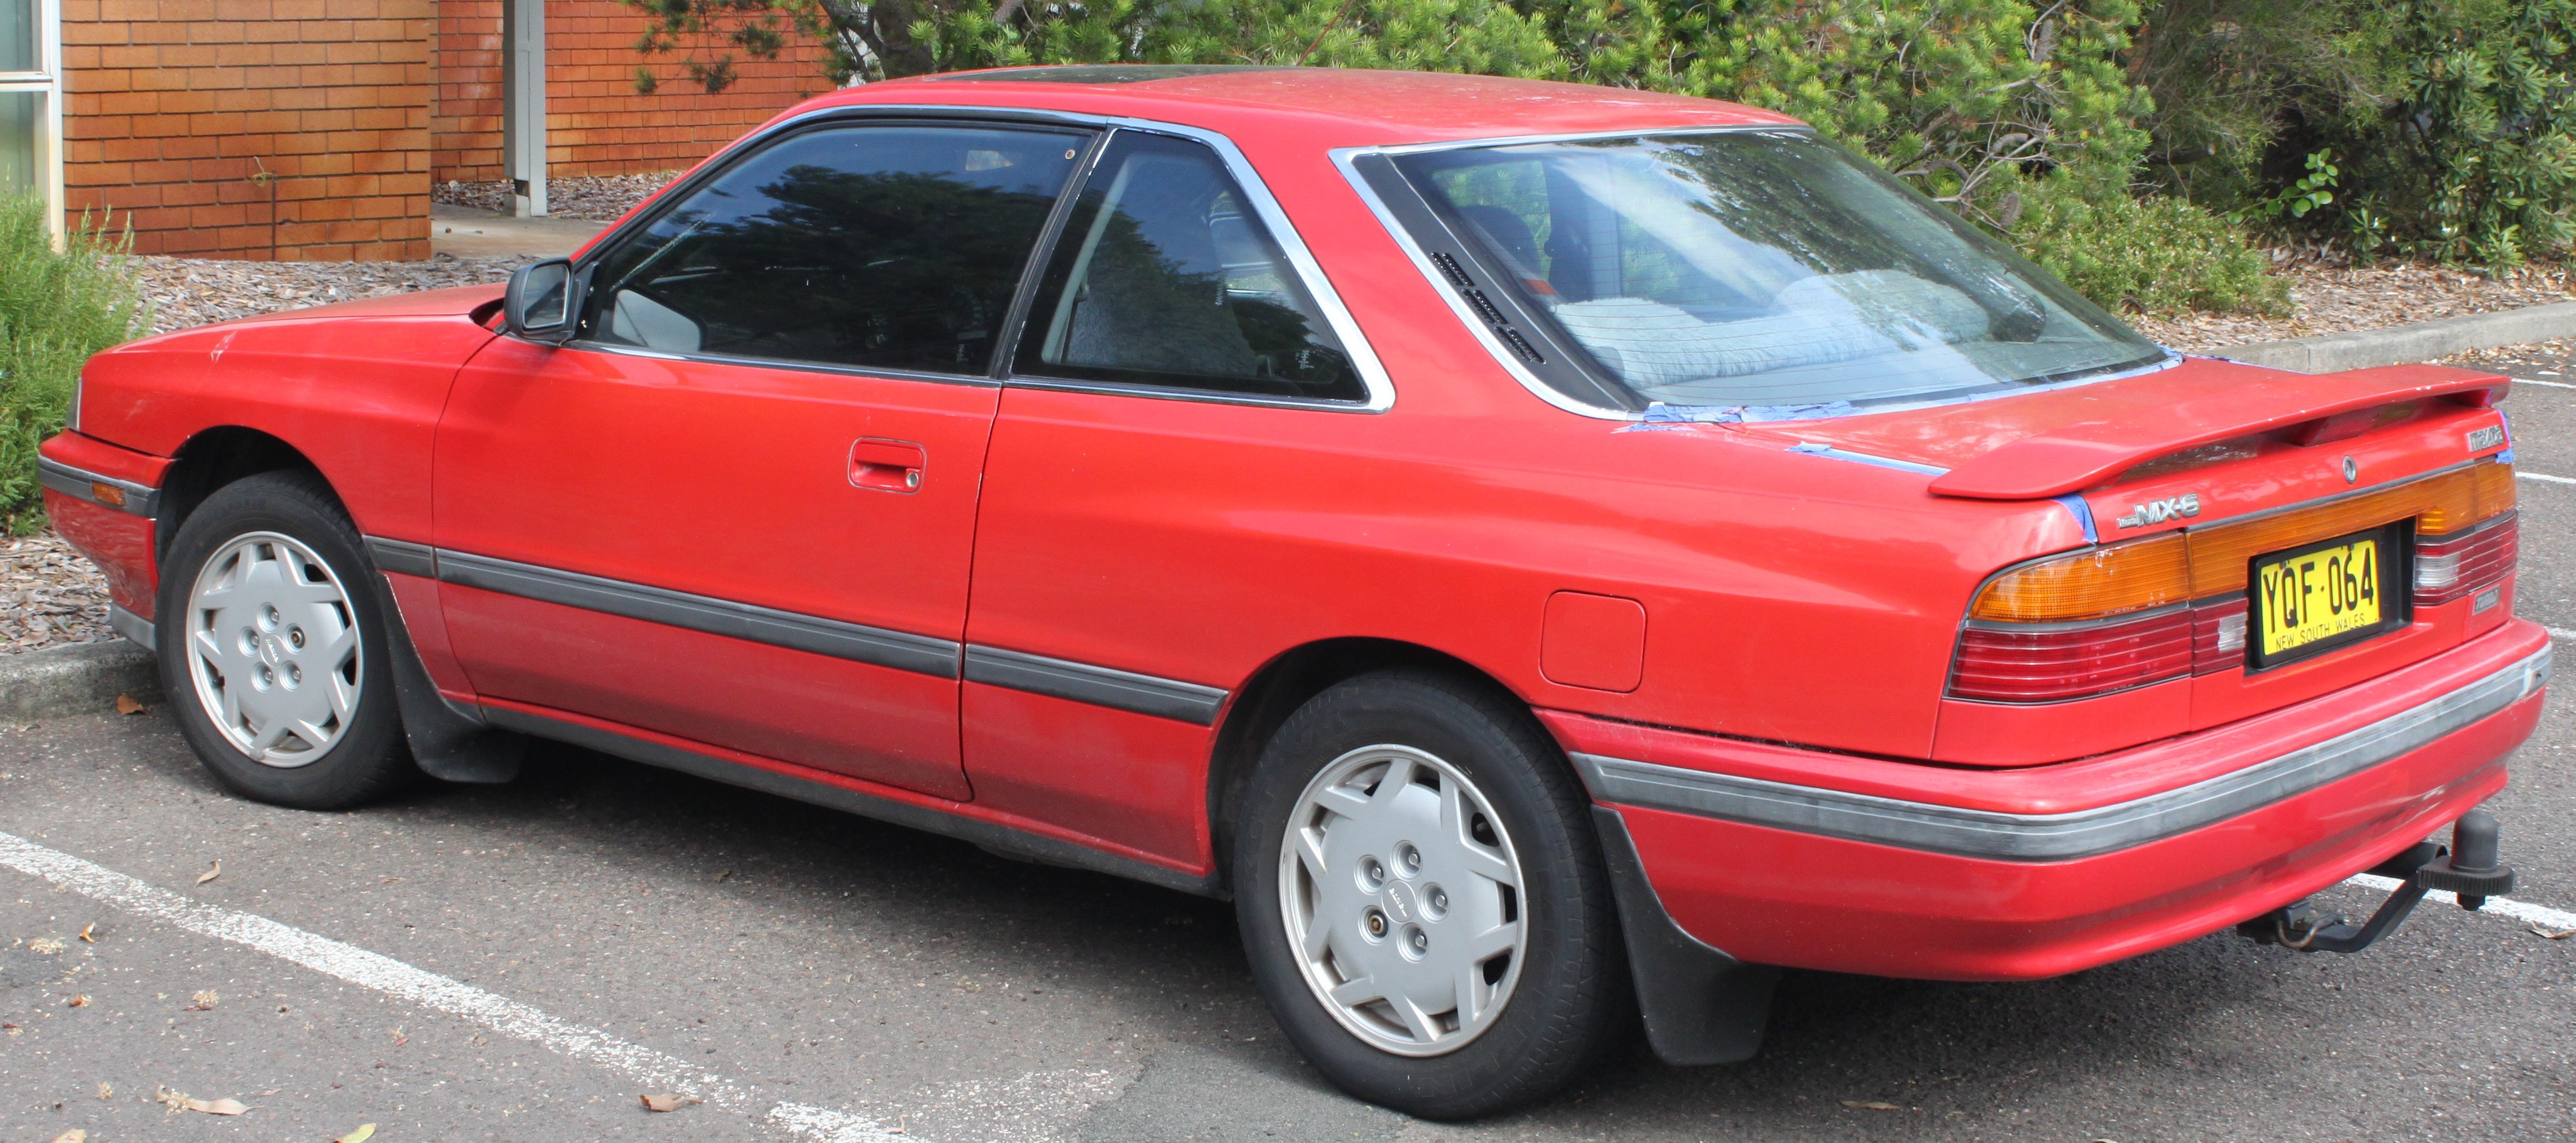 1995 mazda mx 6 ls